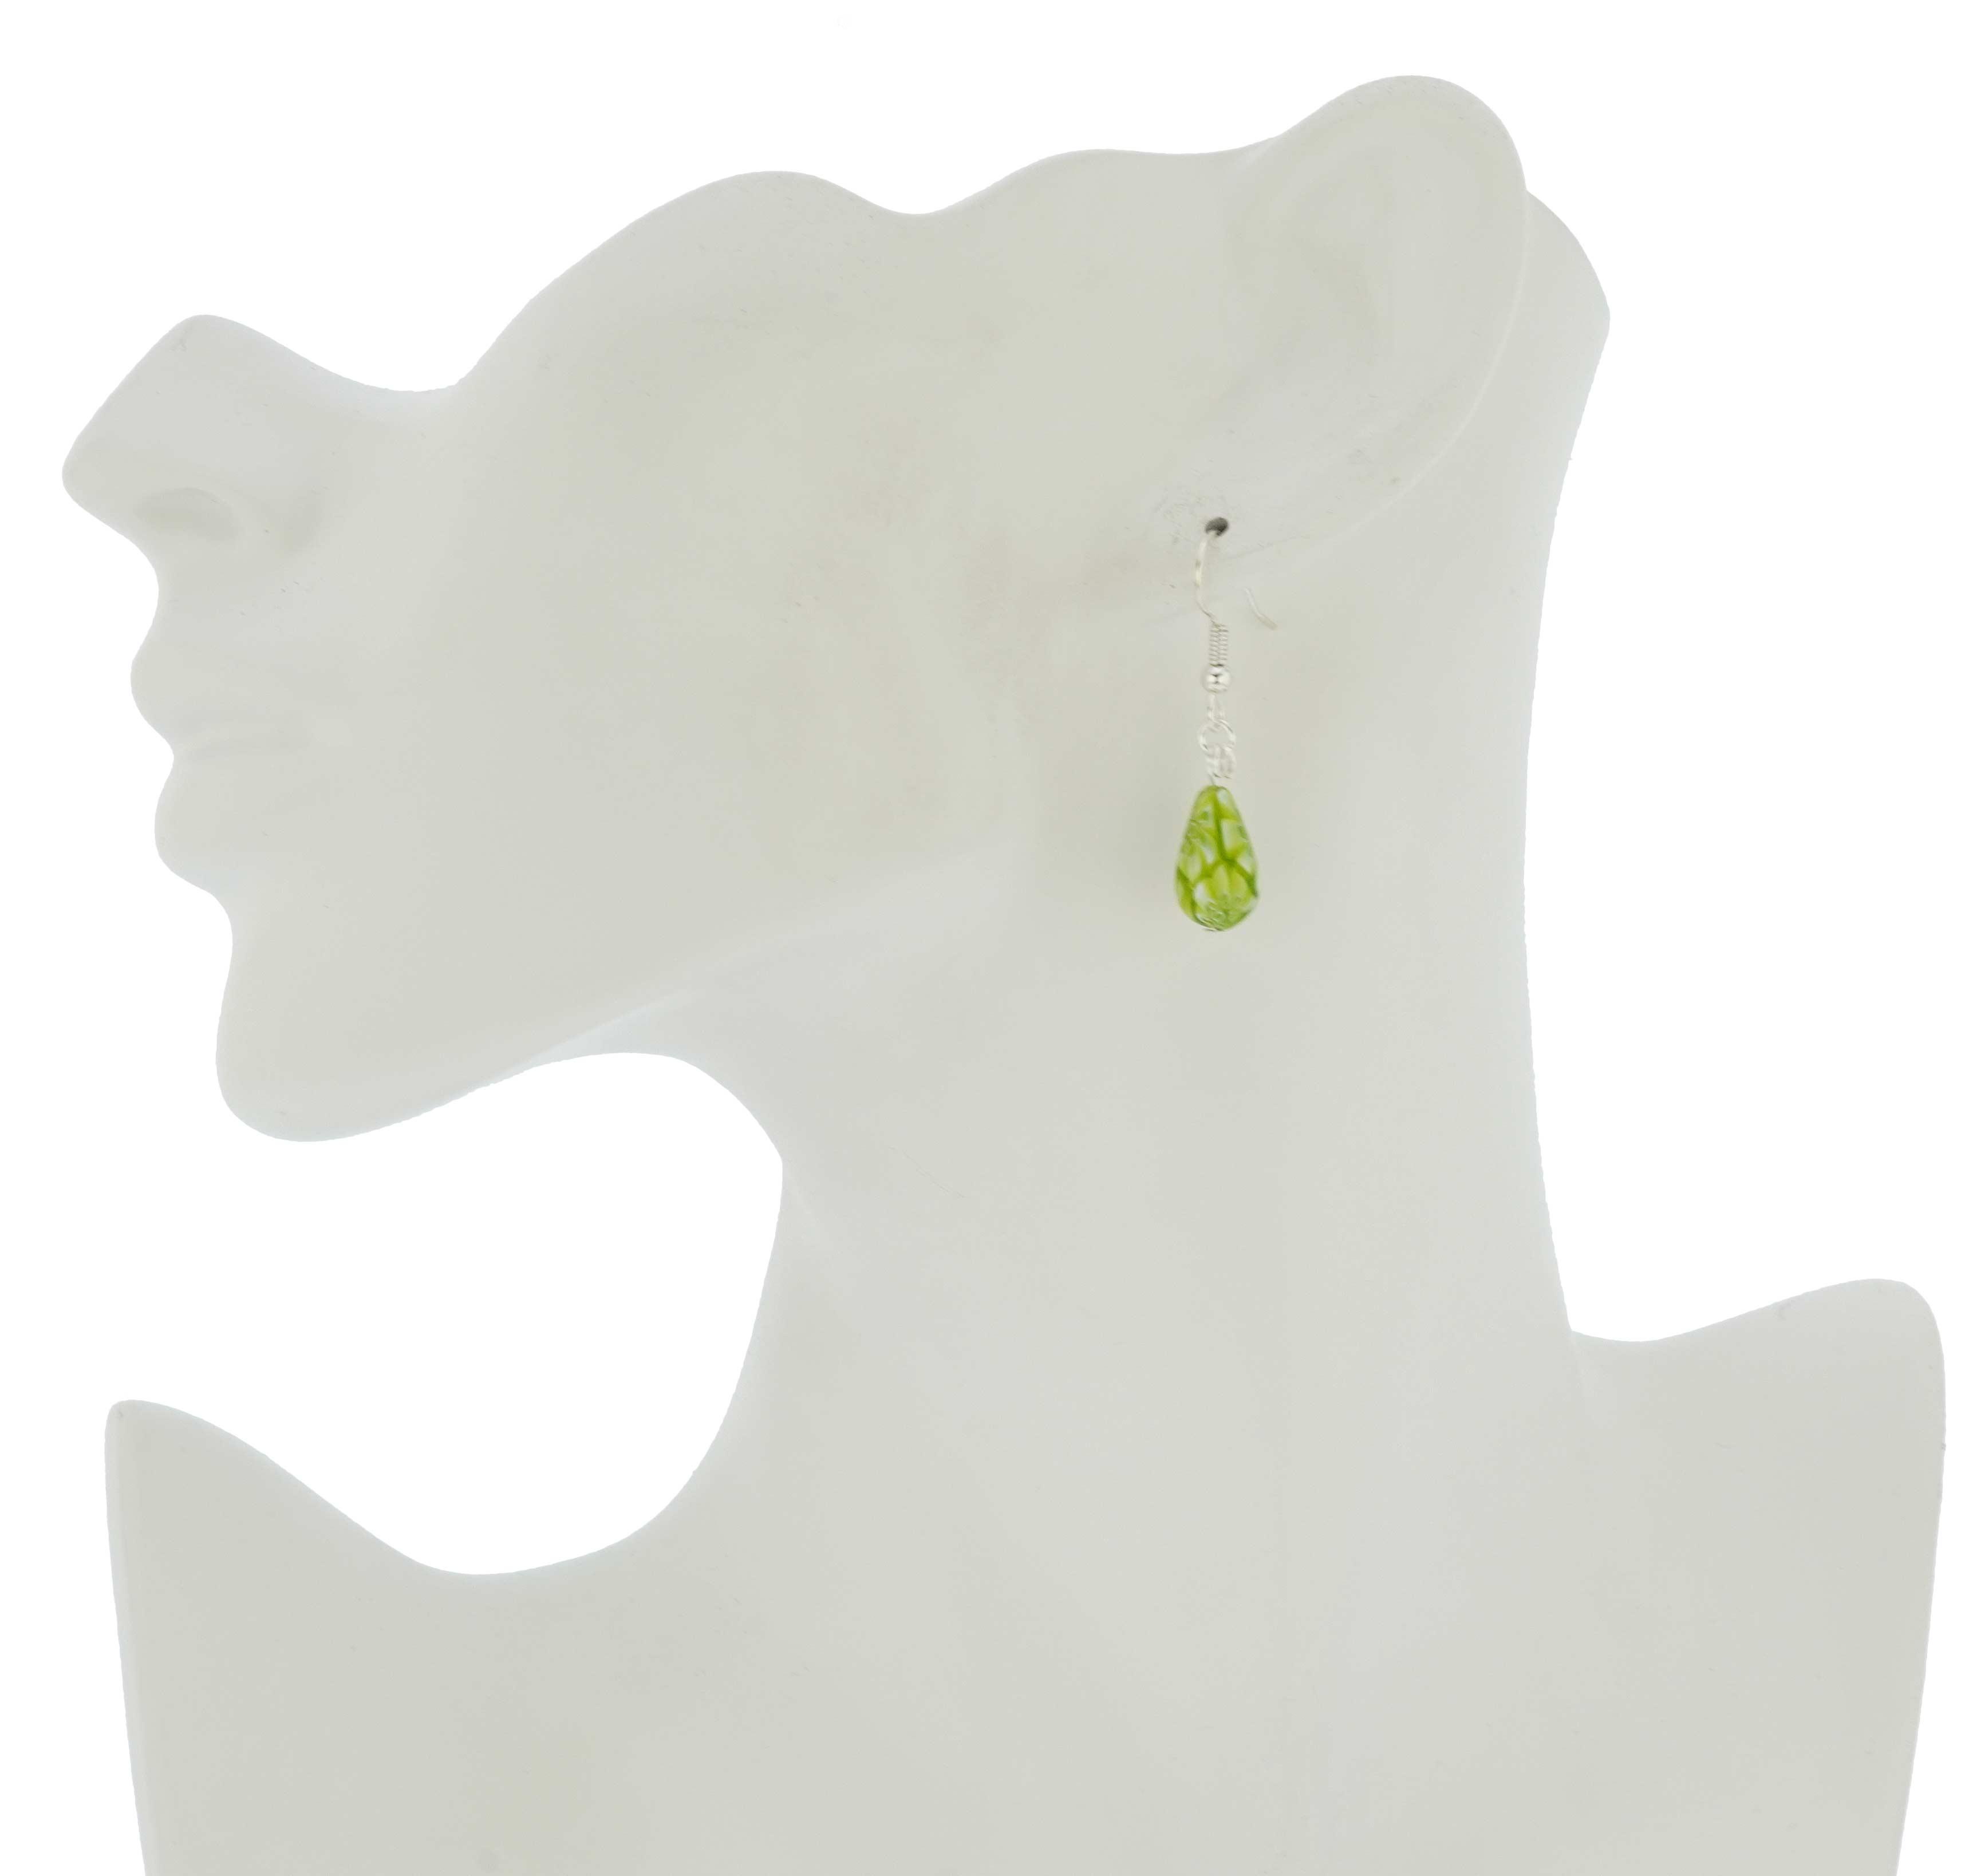 Murano Mosaic Small Millefiori Drop Earrings - Green